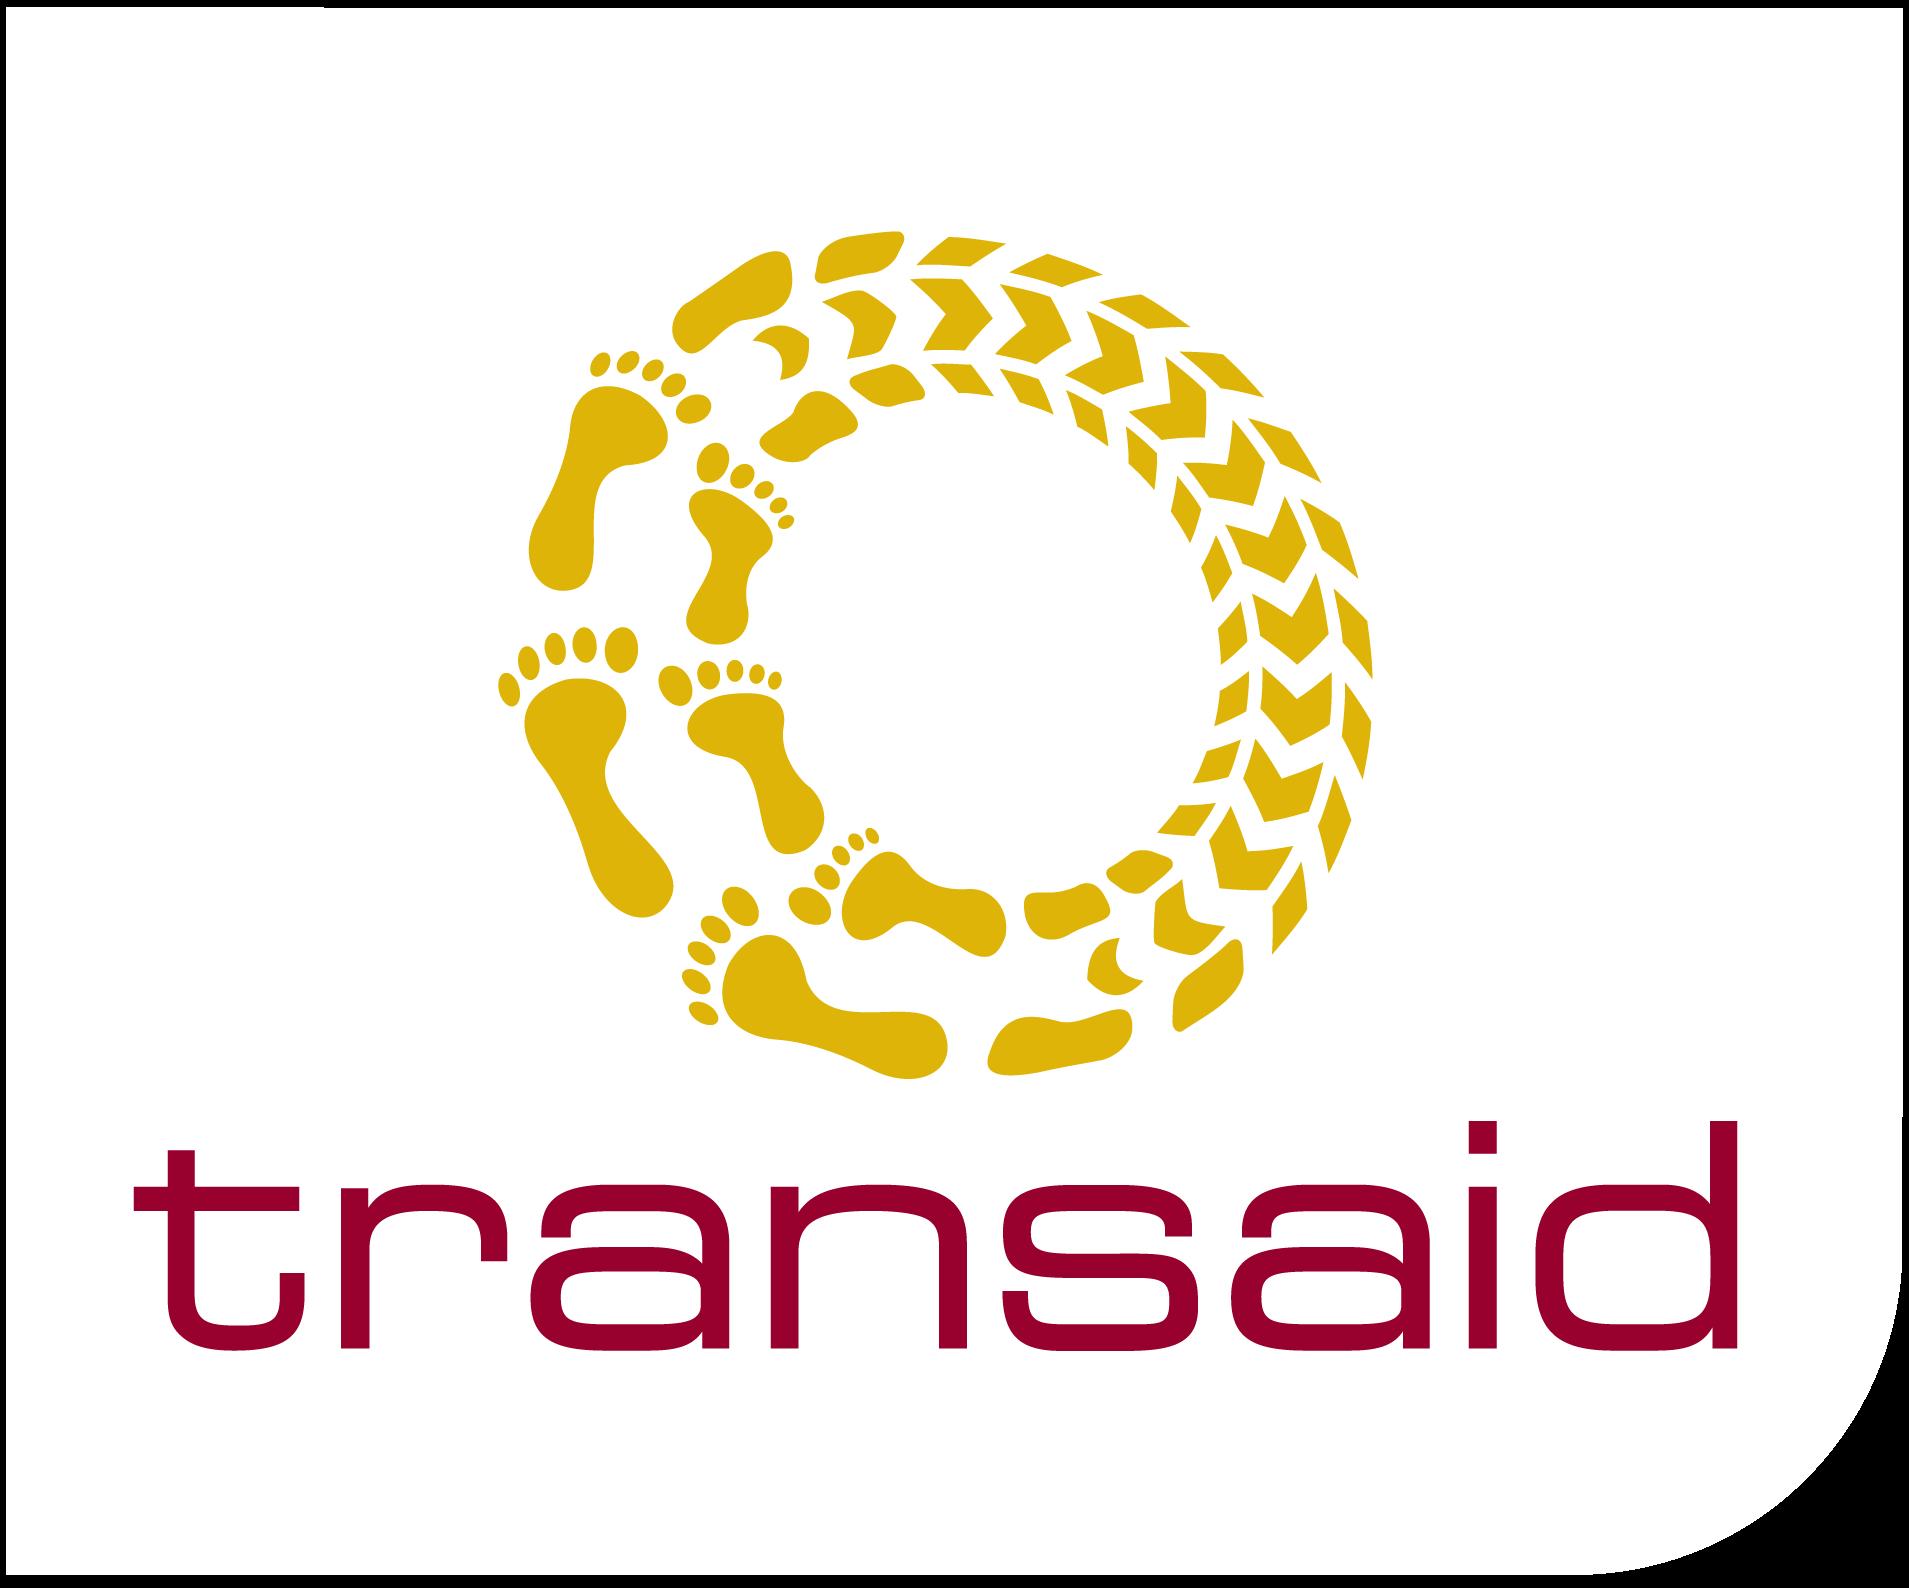 transid